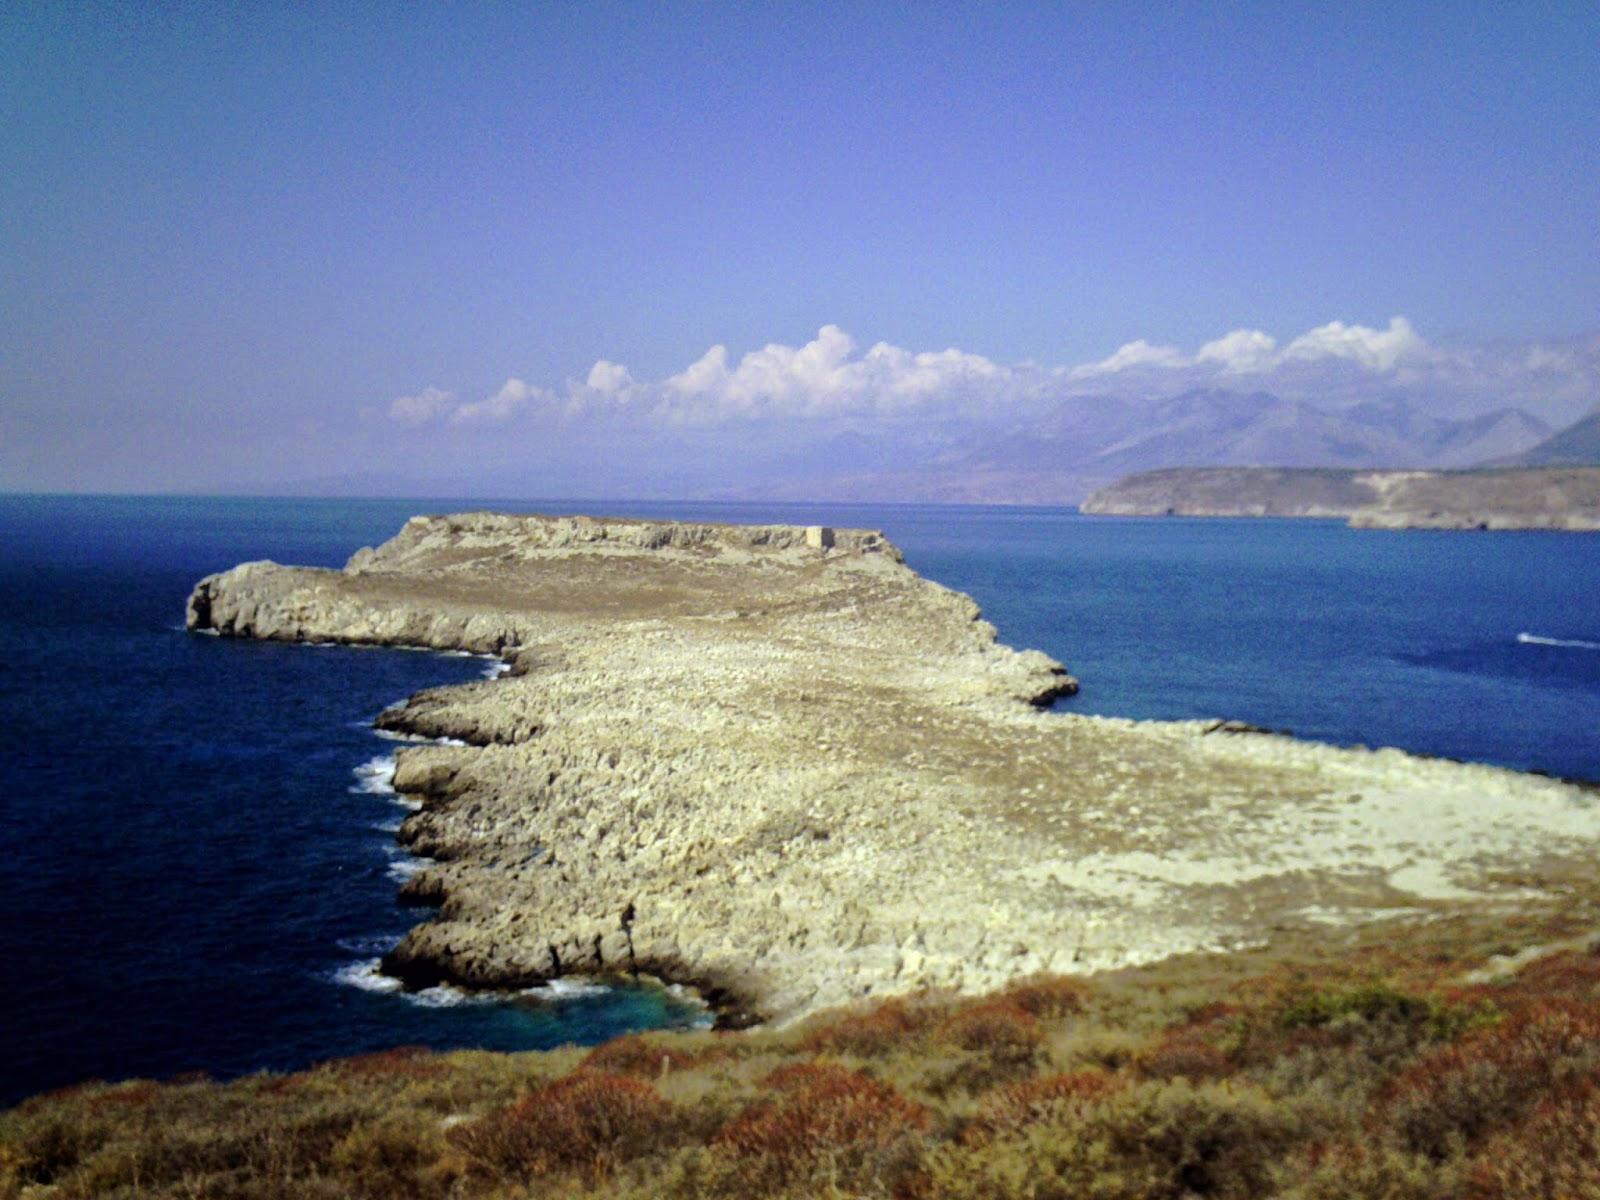 Tigani, Península de Mani, Pelopones, Grecia, Teatre romà